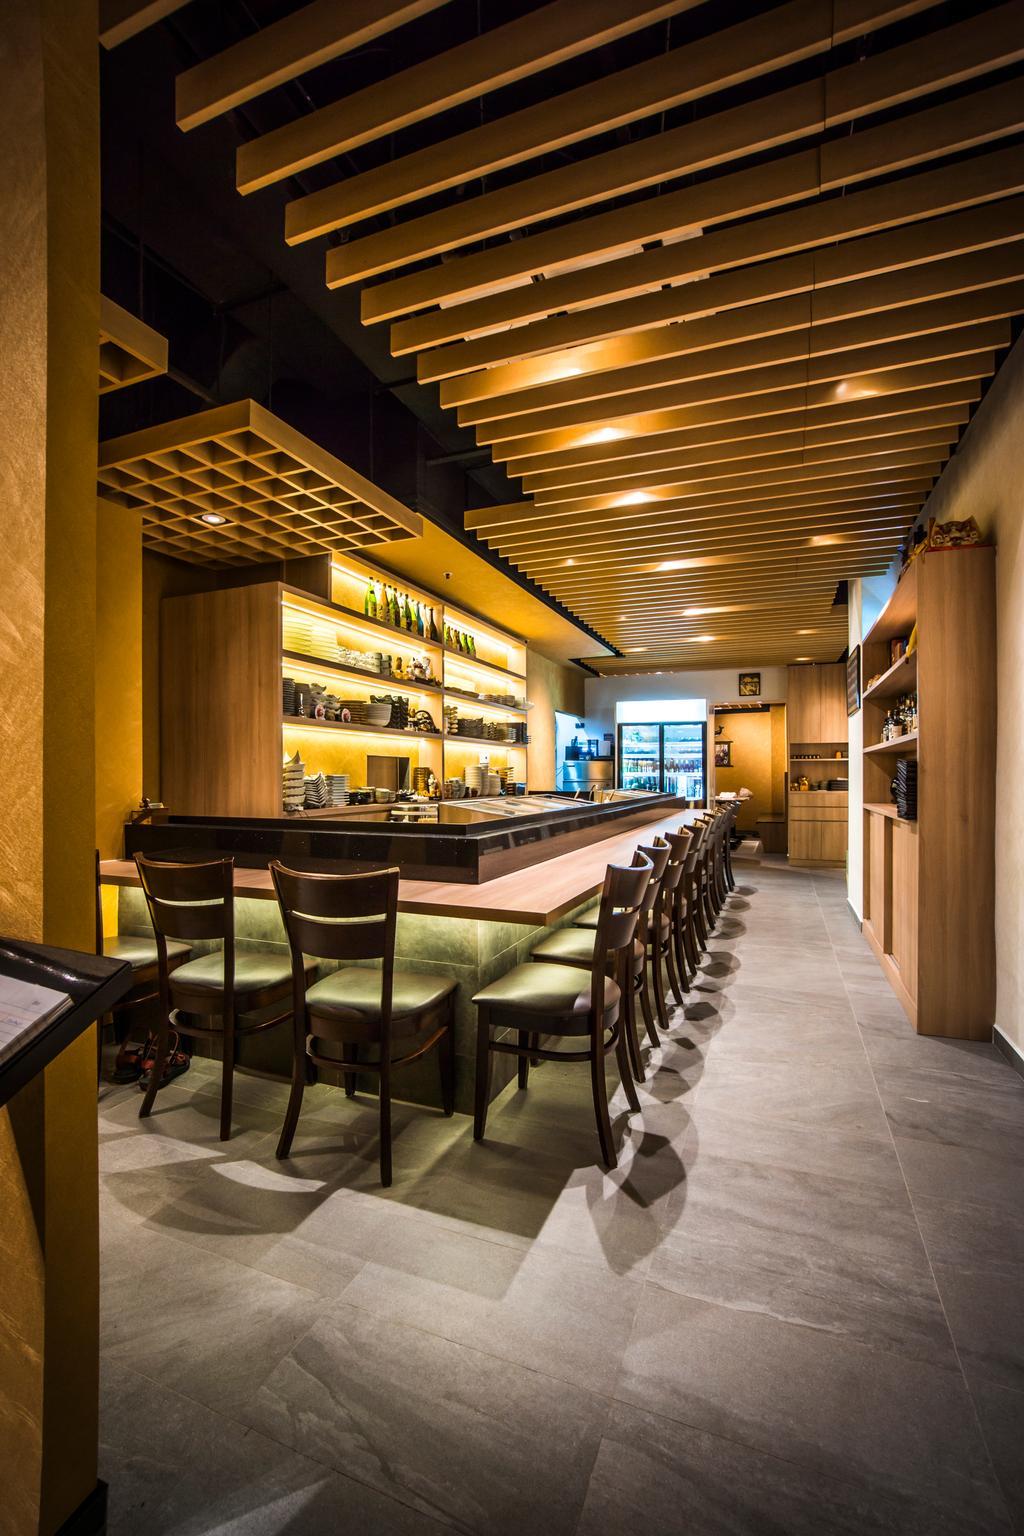 Hakumai, Commercial, Interior Designer, Flo Design, Contemporary, Chair, Furniture, Restaurant, Food, Food Court, Bar Counter, Pub, Cafe